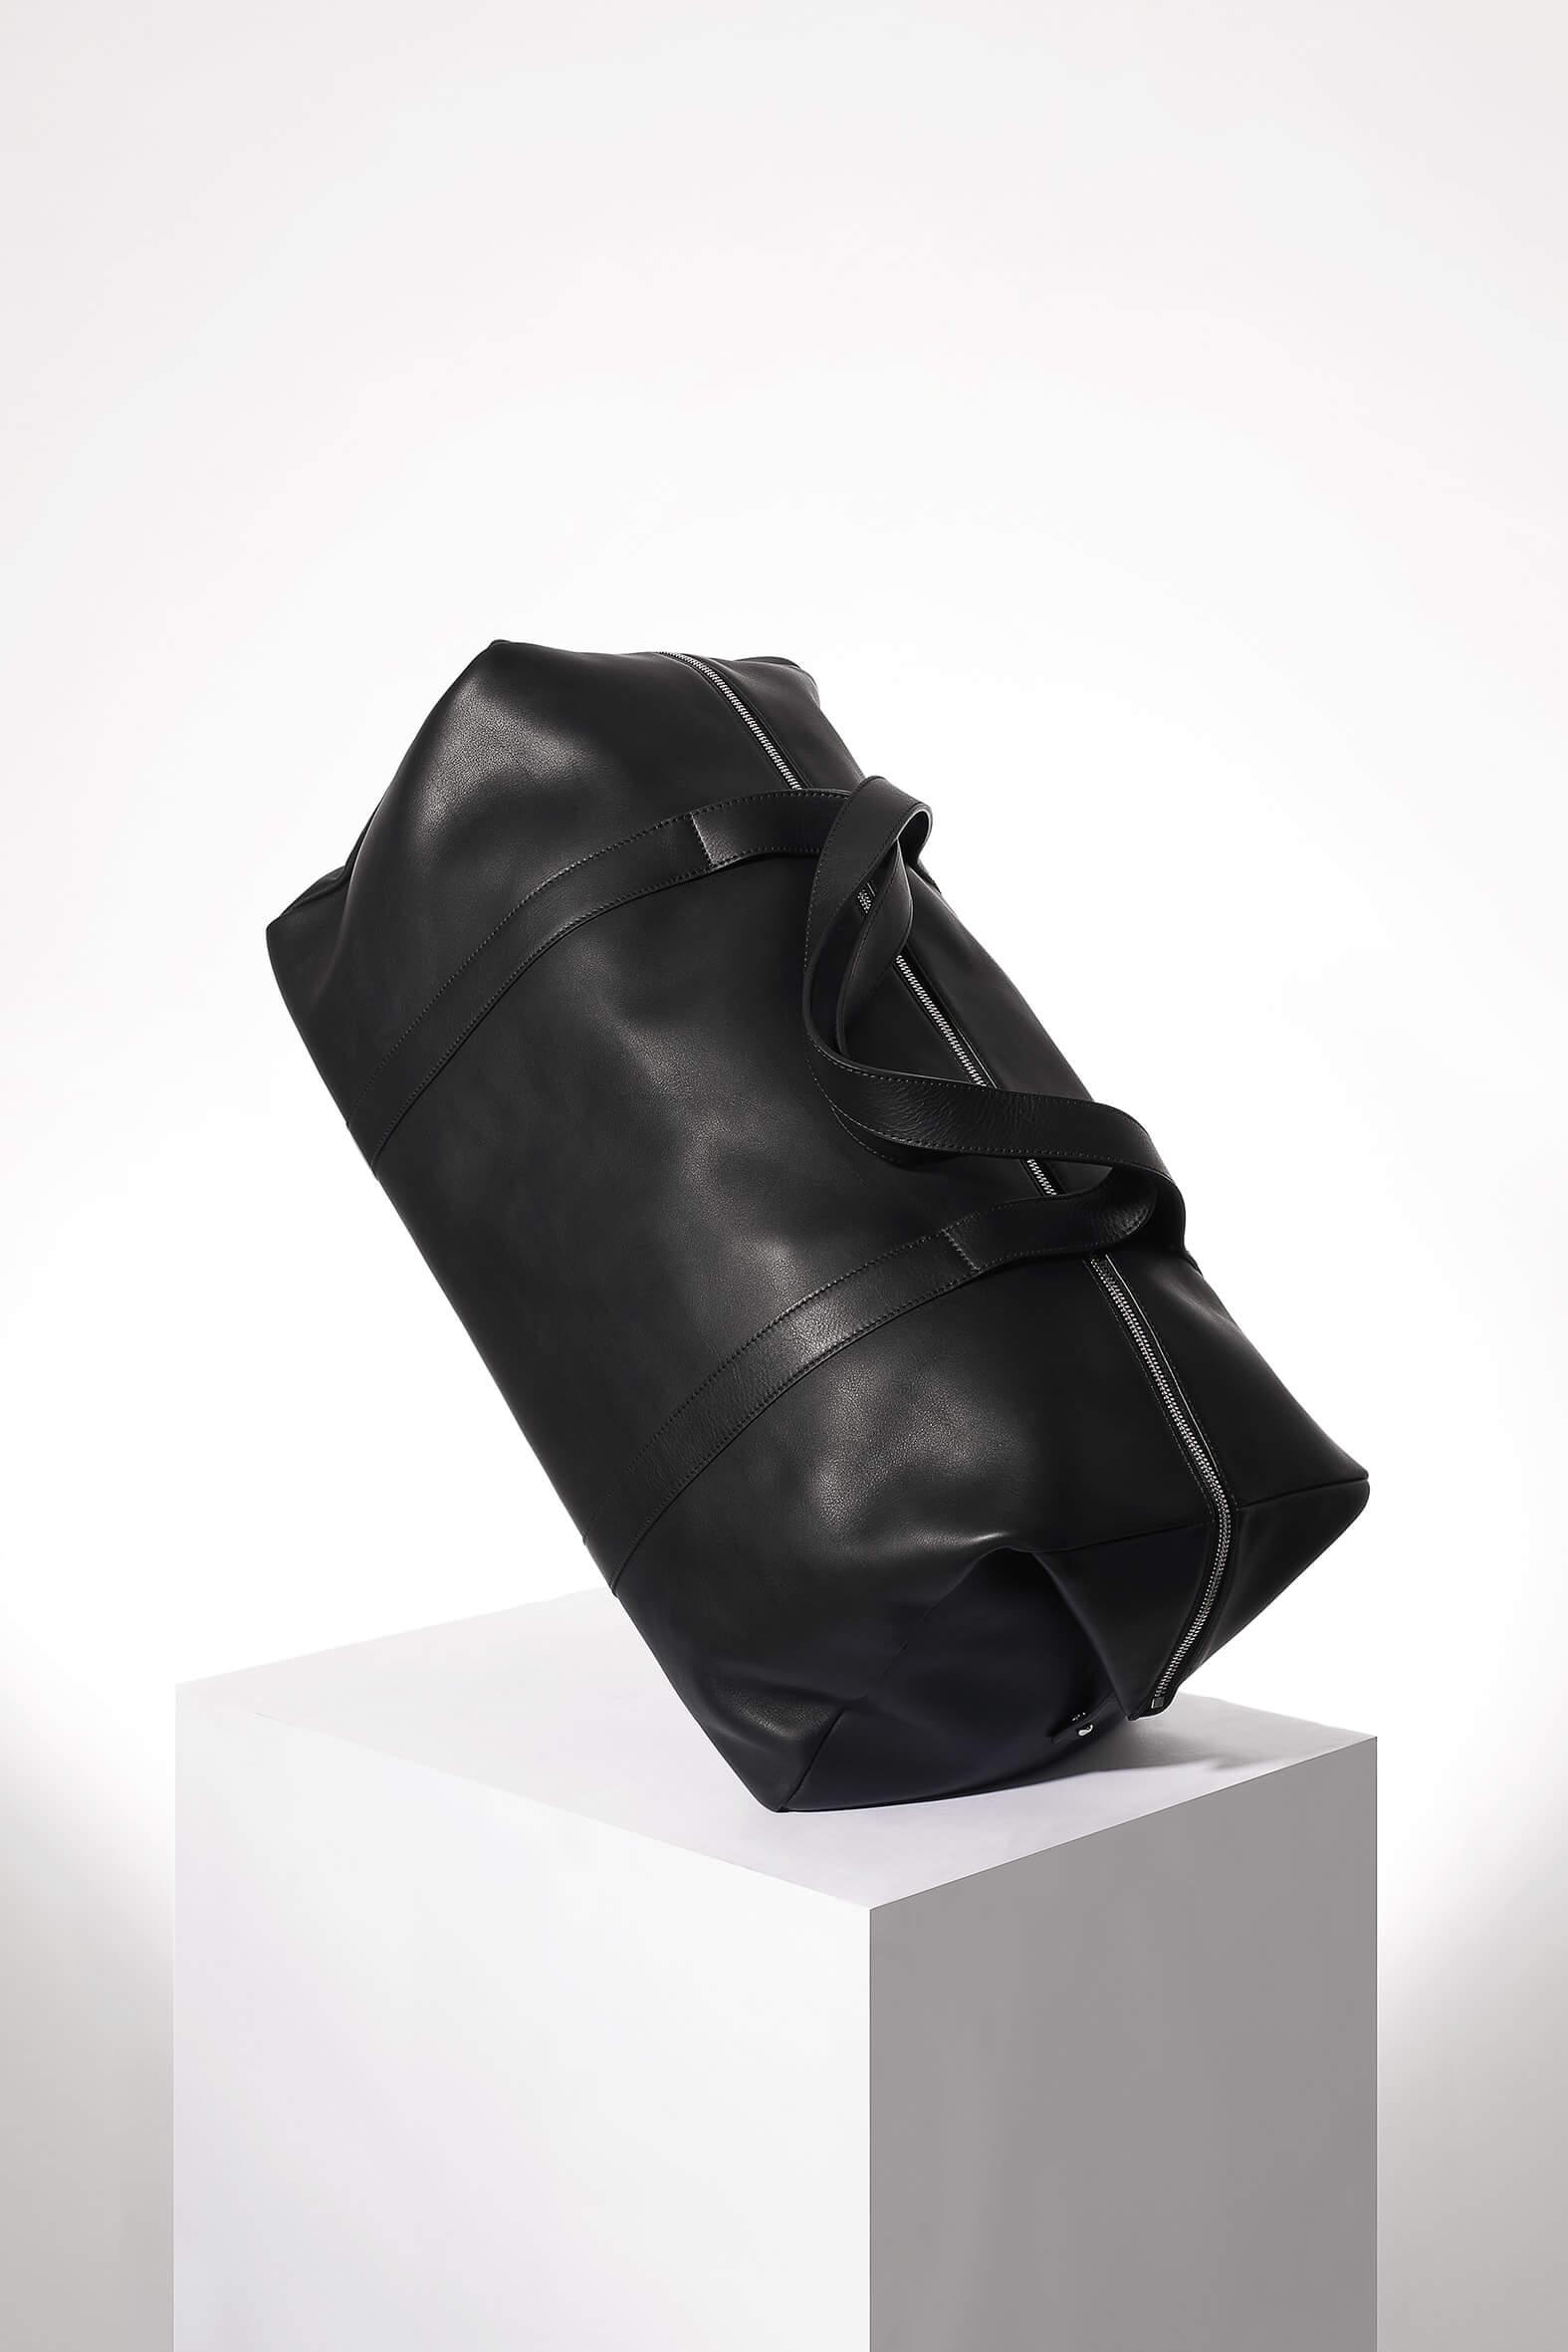 Lampi Men's Bag Collection